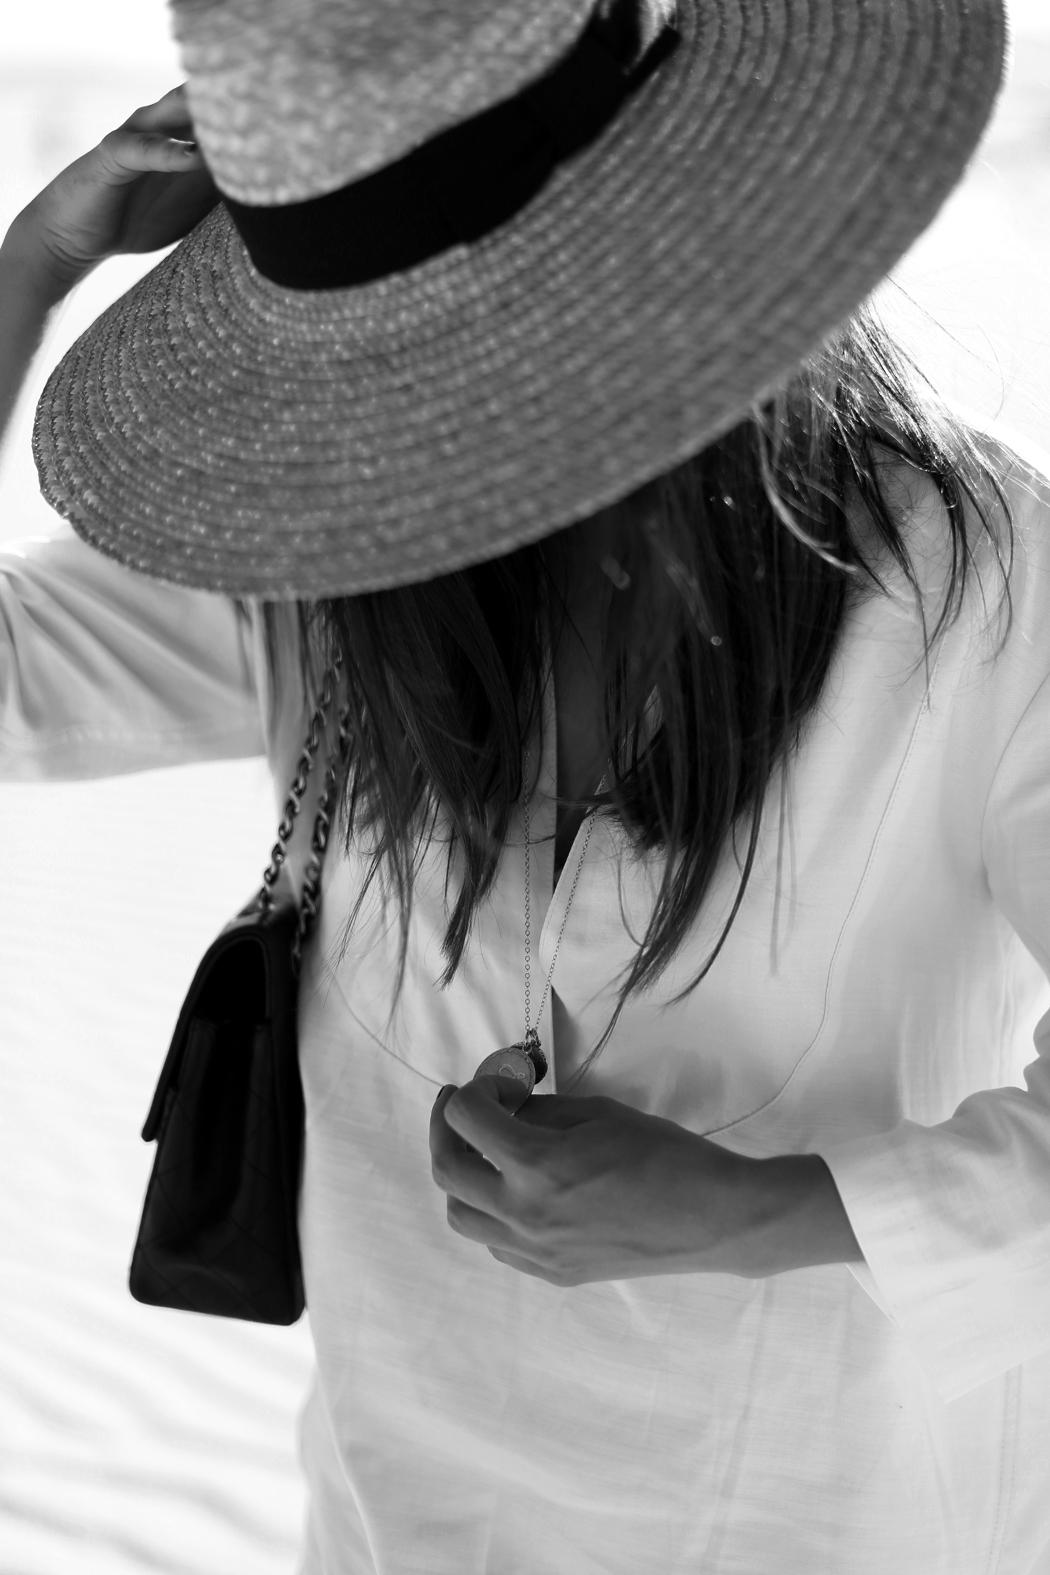 Filippa K White Dress Outfit